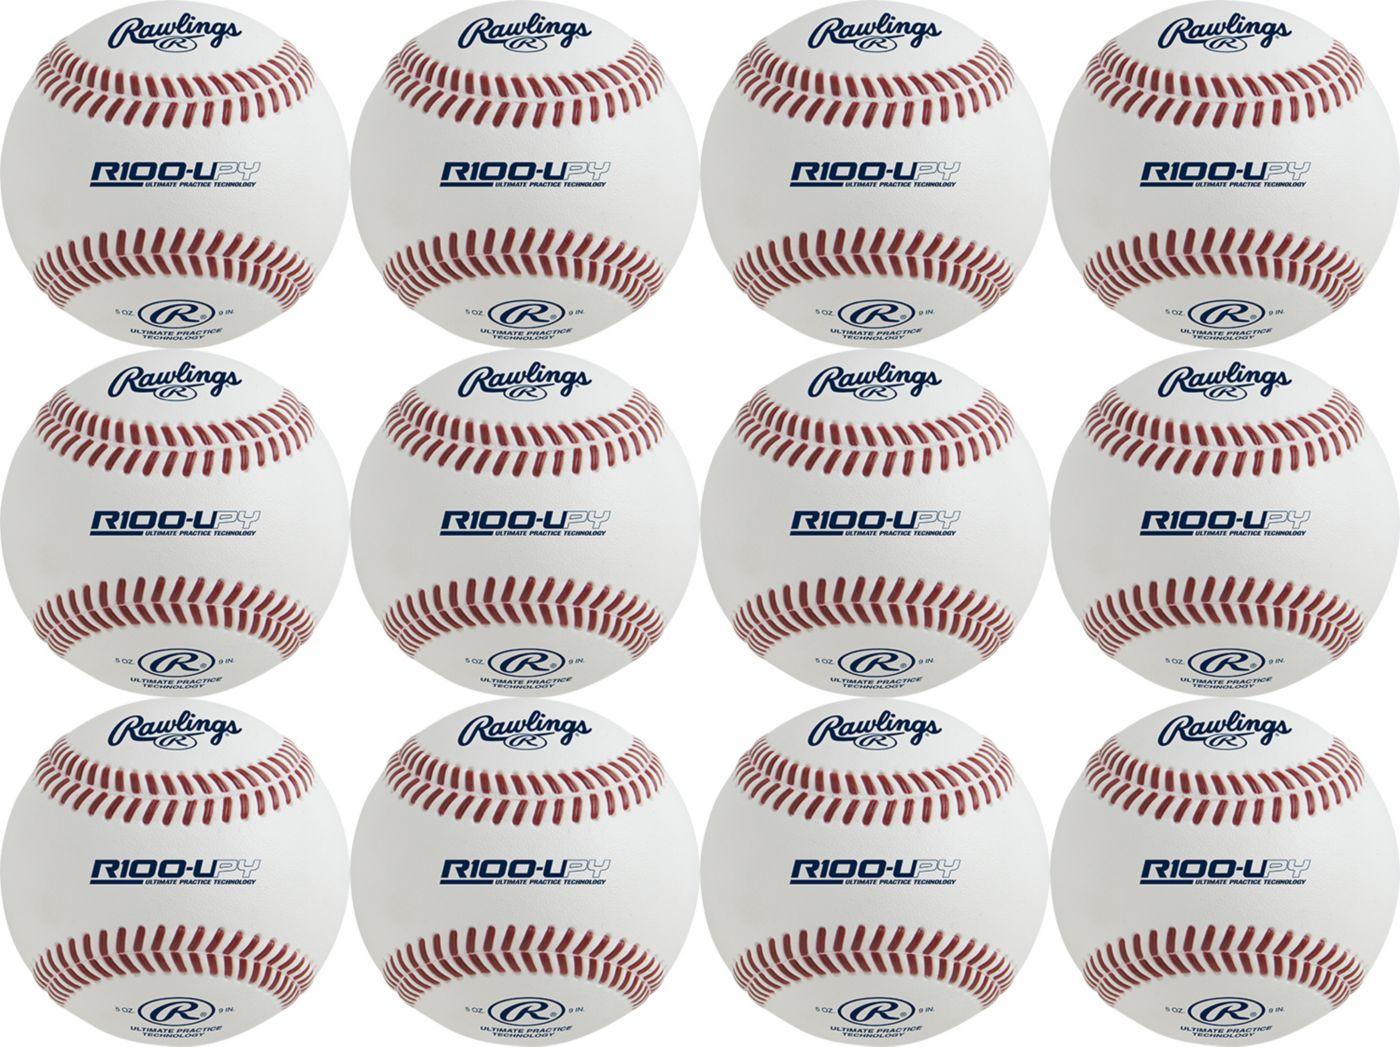 Rawlings R100-UPY Youth Ultimate Batting Practice Baseballs -12 Pack